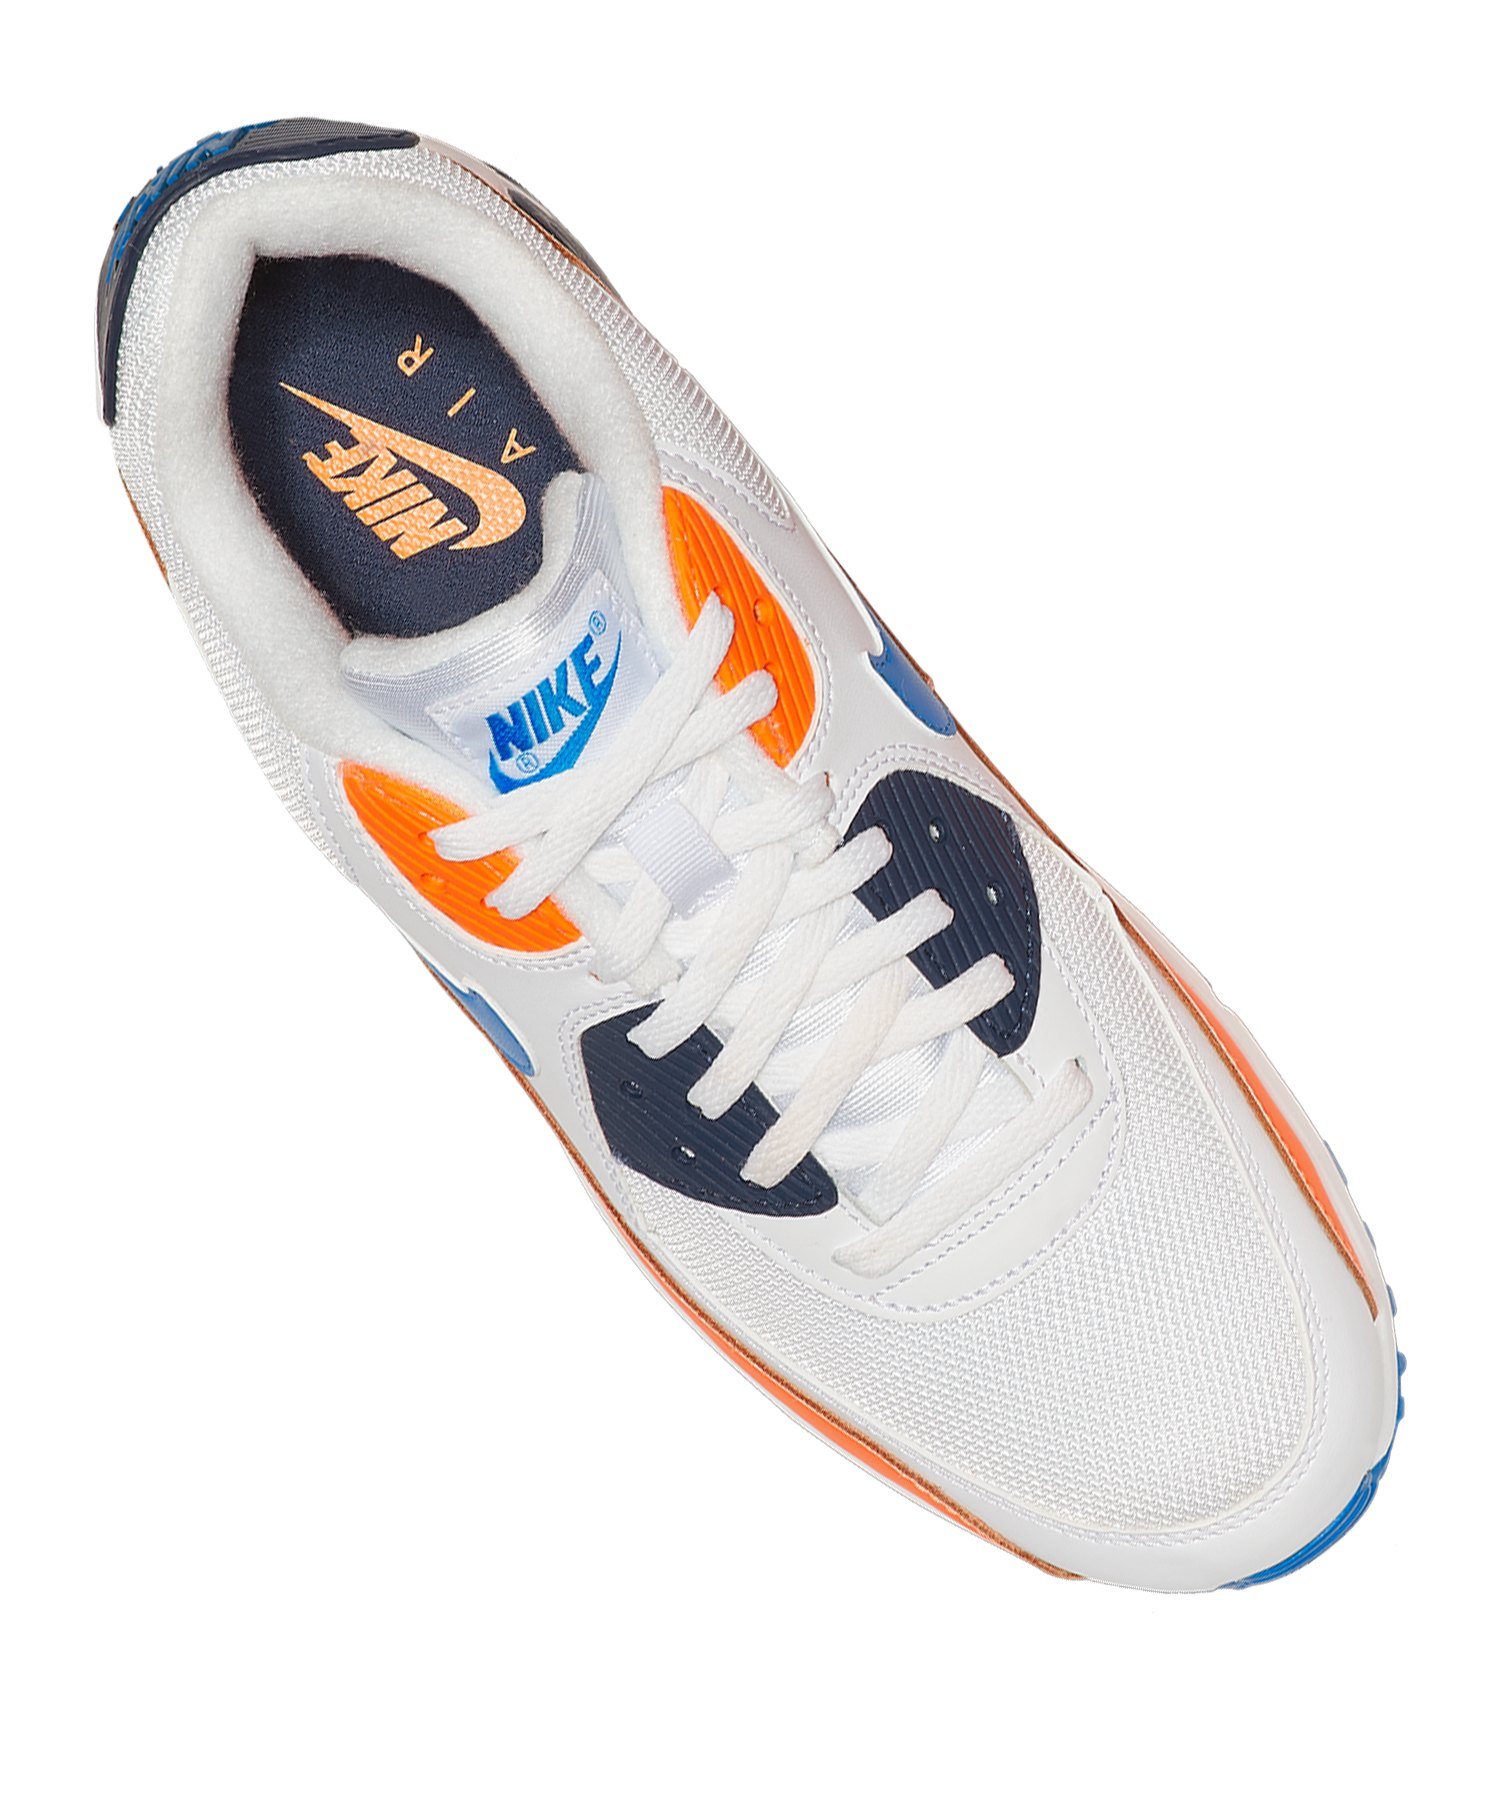 best service da765 83352 ... Nike Air Max 90 Essential Sneaker Weiss Blau F104 - Weiss ...